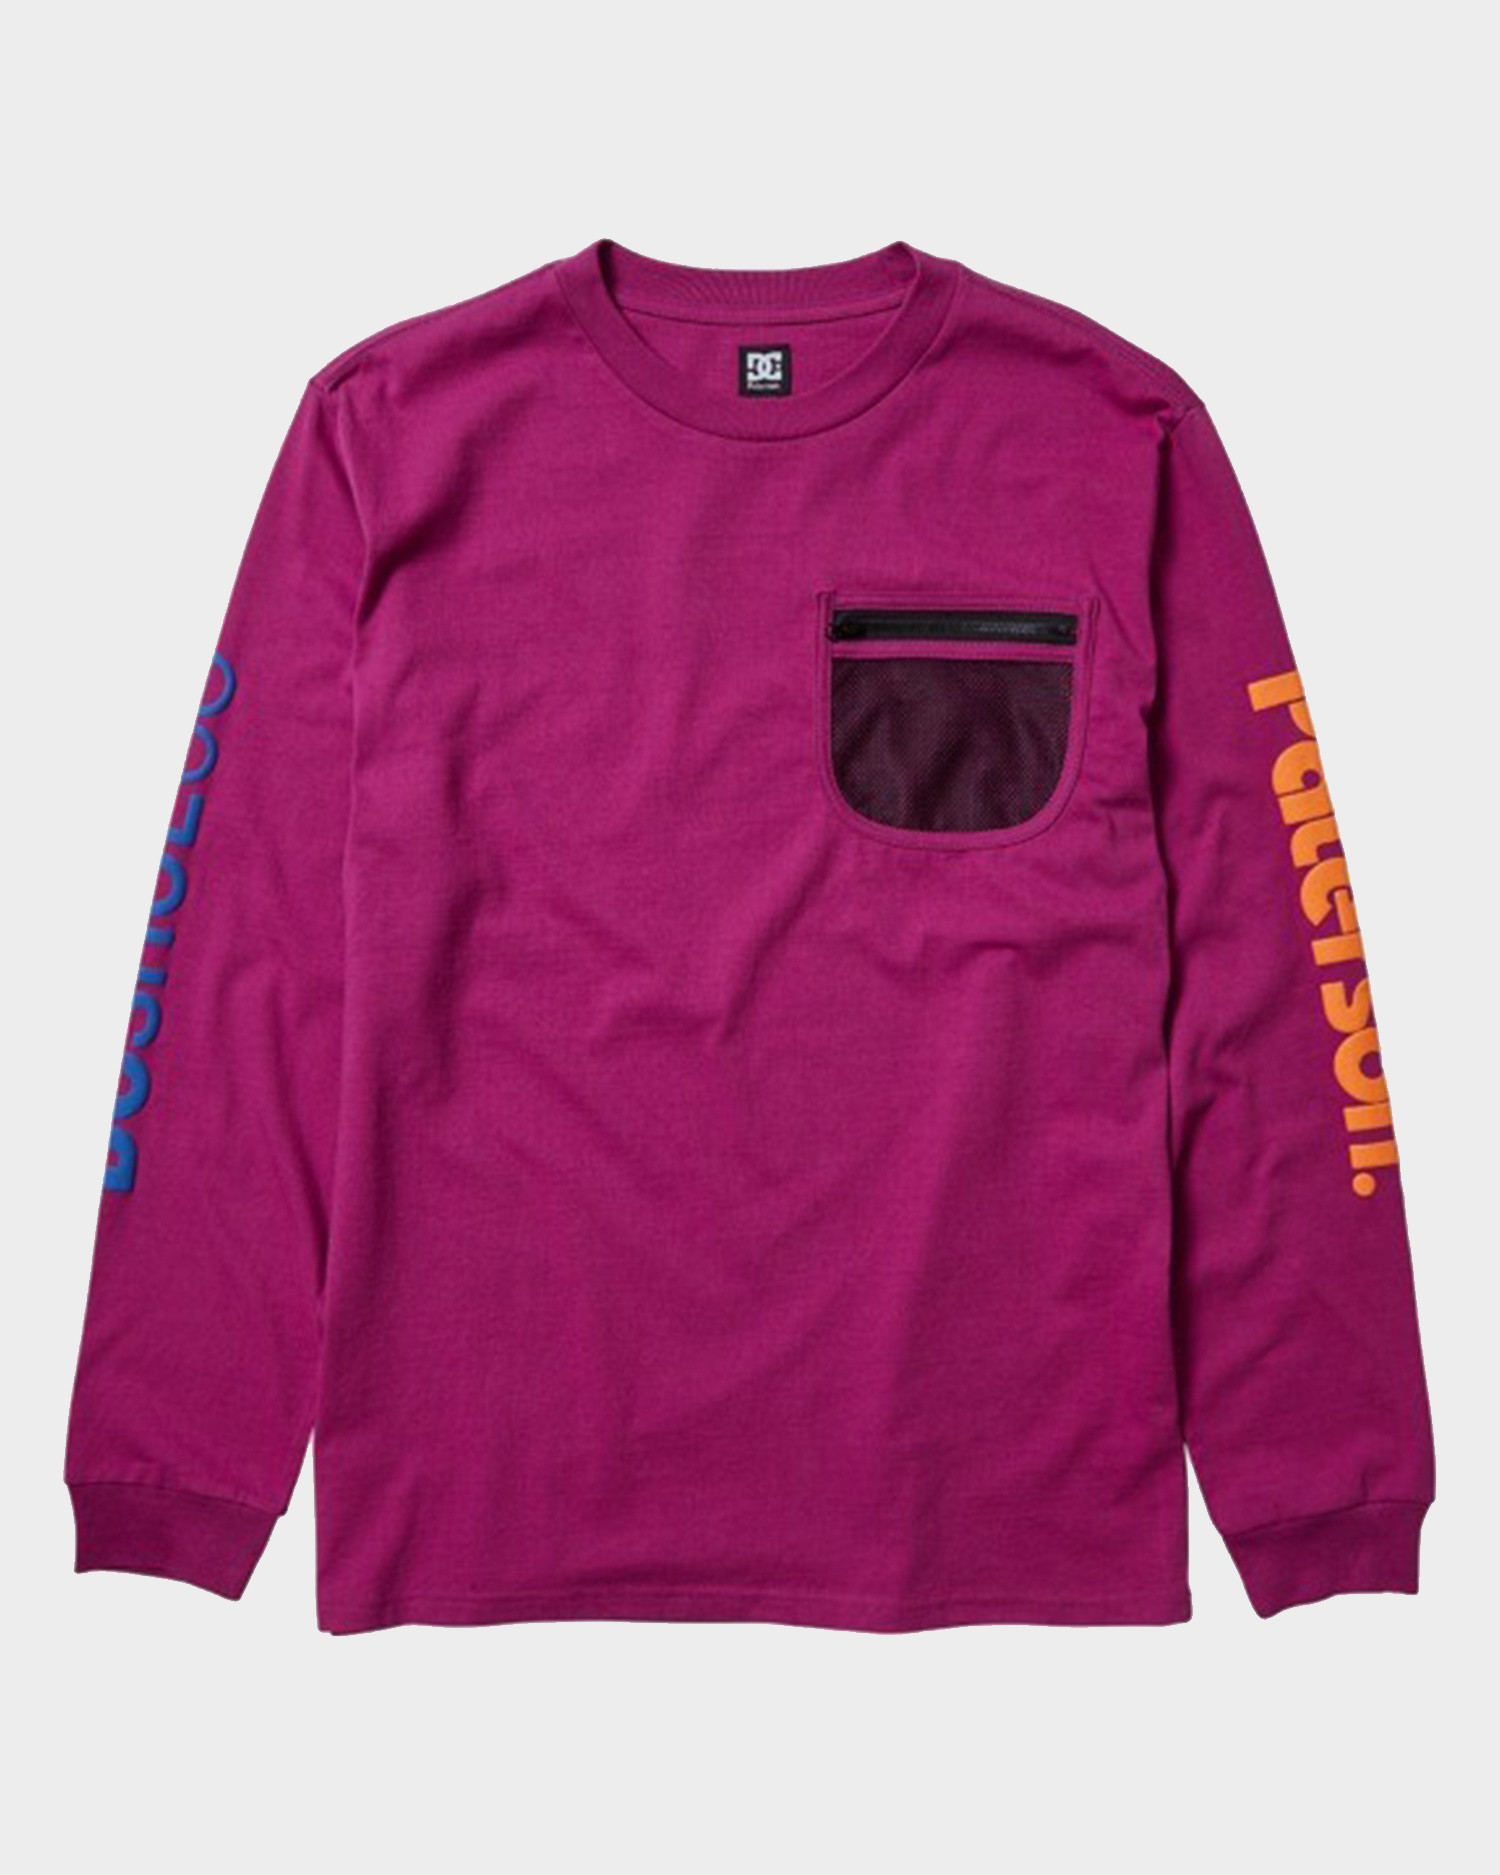 DC X Patseron Field Longlseeve Tech T-shirt